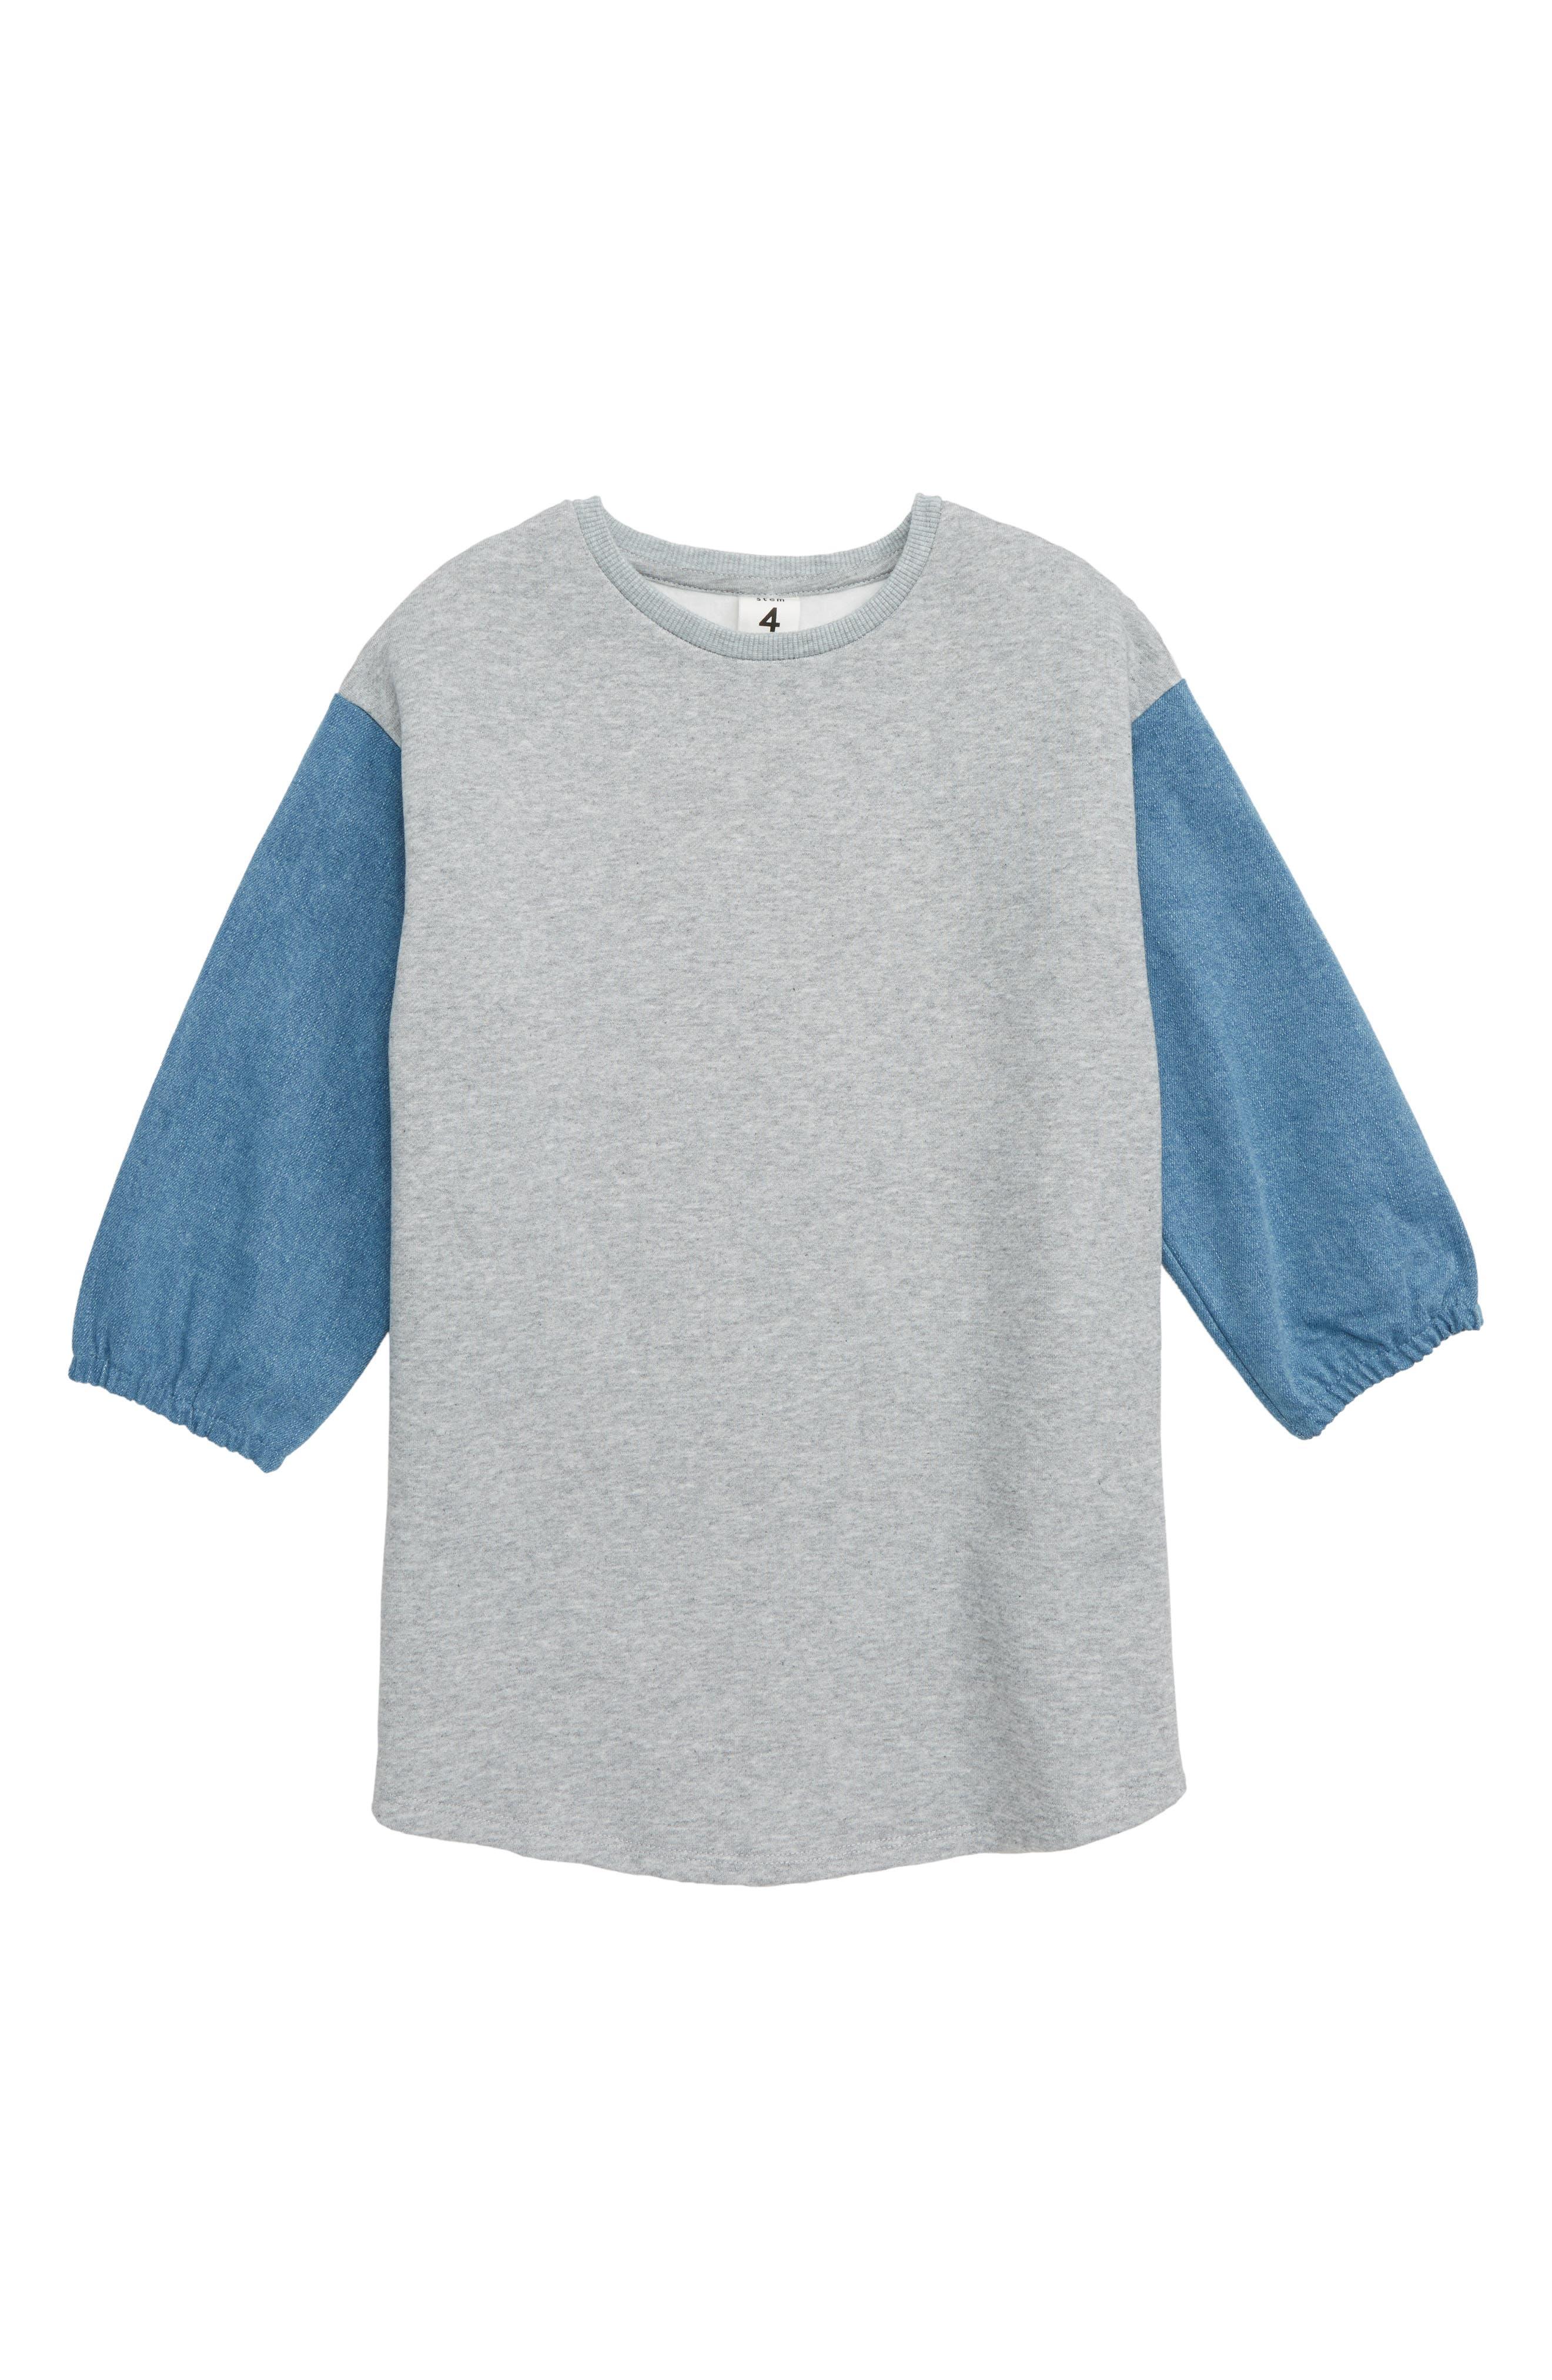 Denim Puff Sleeve Sweatshirt Dress,                         Main,                         color, 030